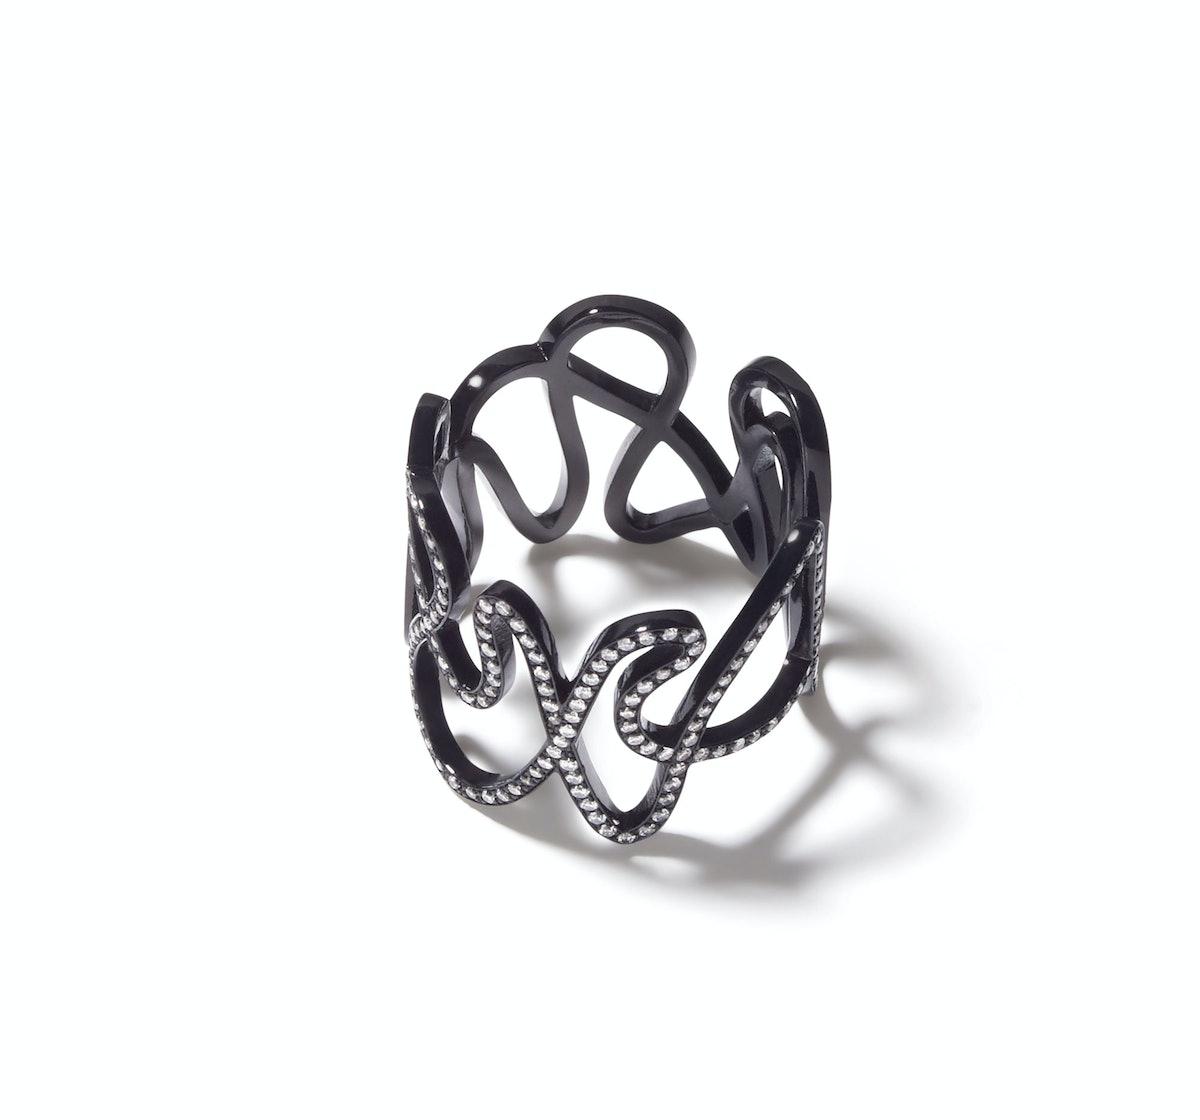 Repossi gold and diamond ring